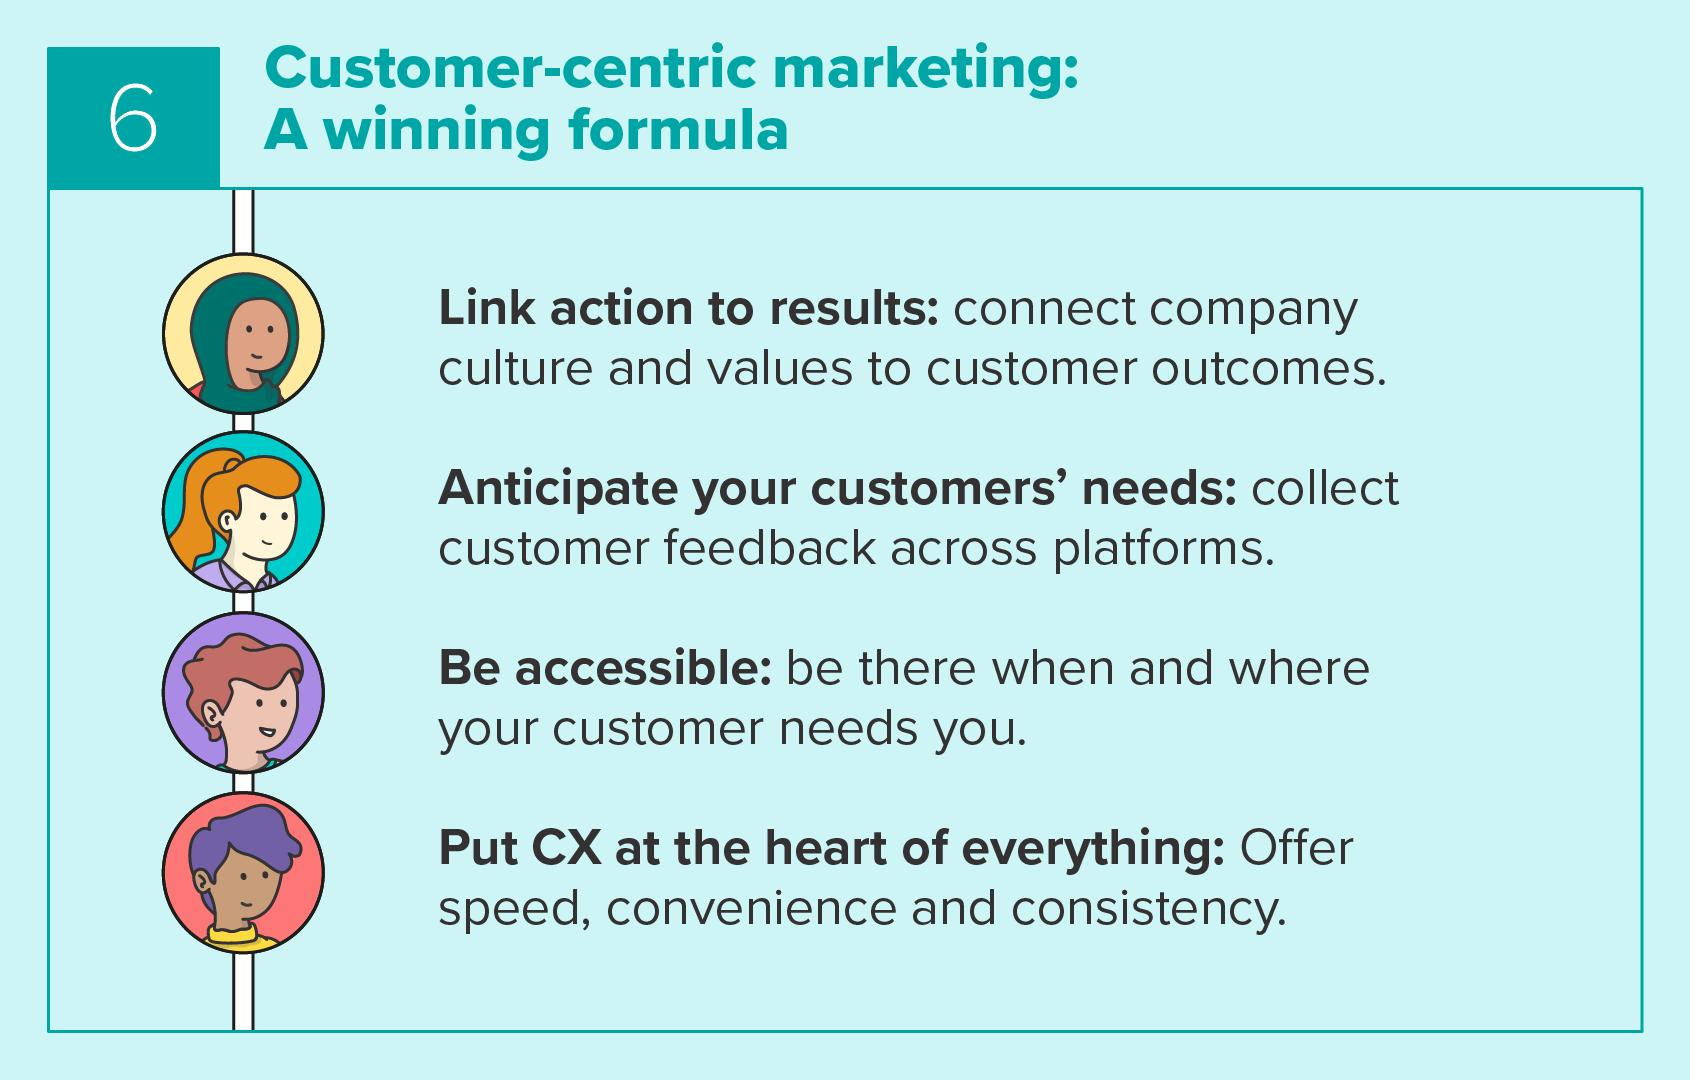 A winning formula for customer-centric marketing